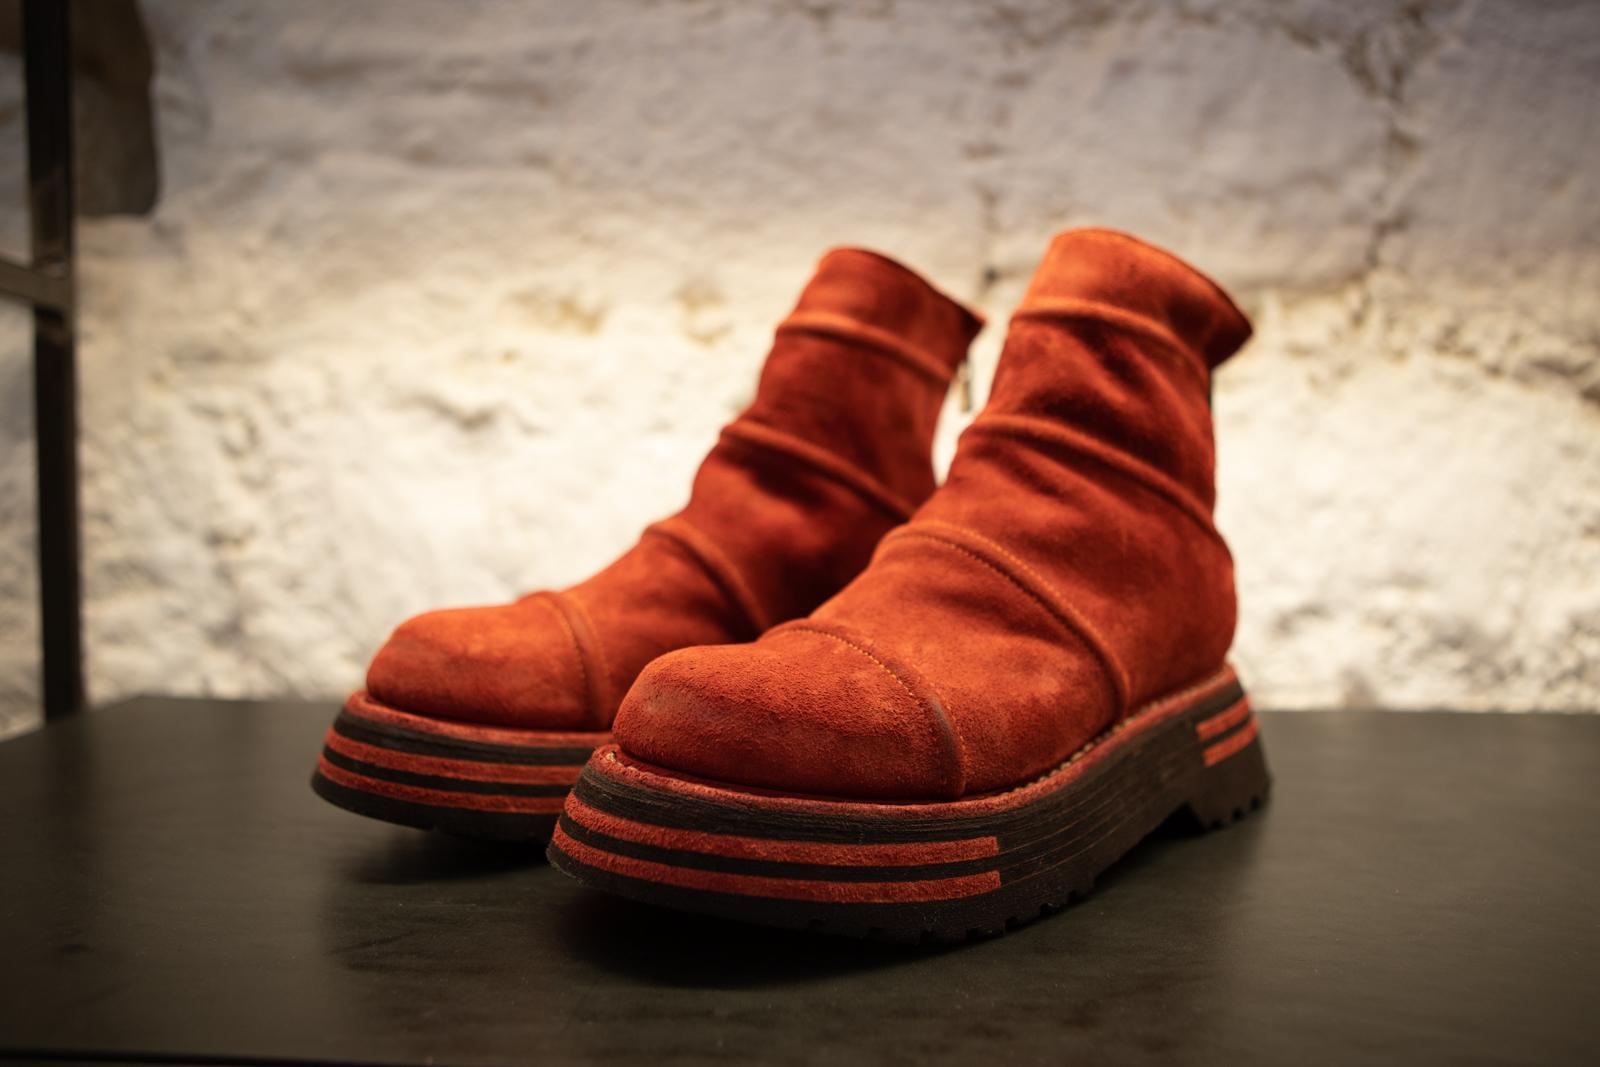 Guidi Back Zip Stich Boots in Orange Suede FW20